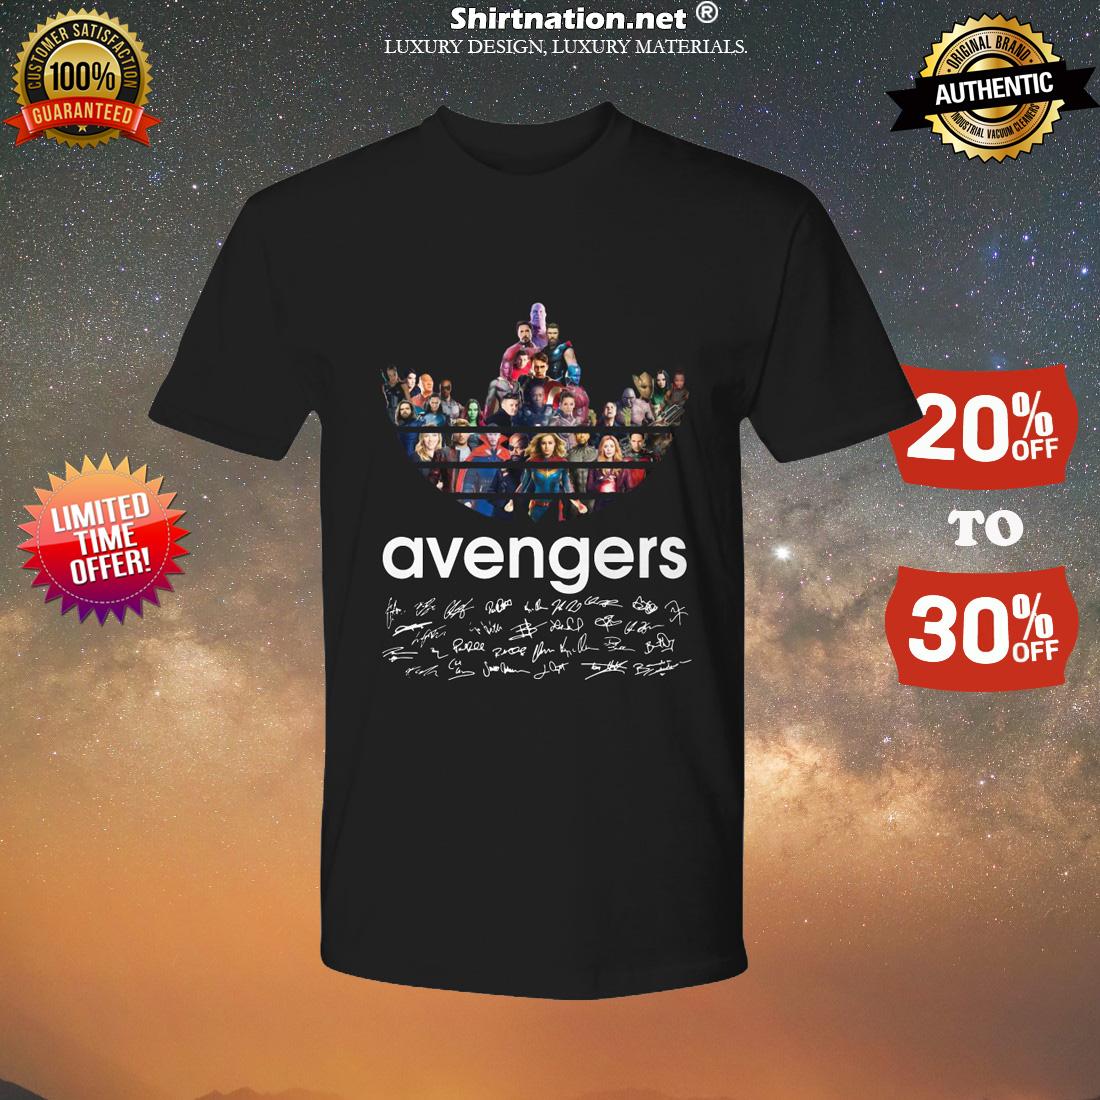 Adidas Avengers Signatures shirt